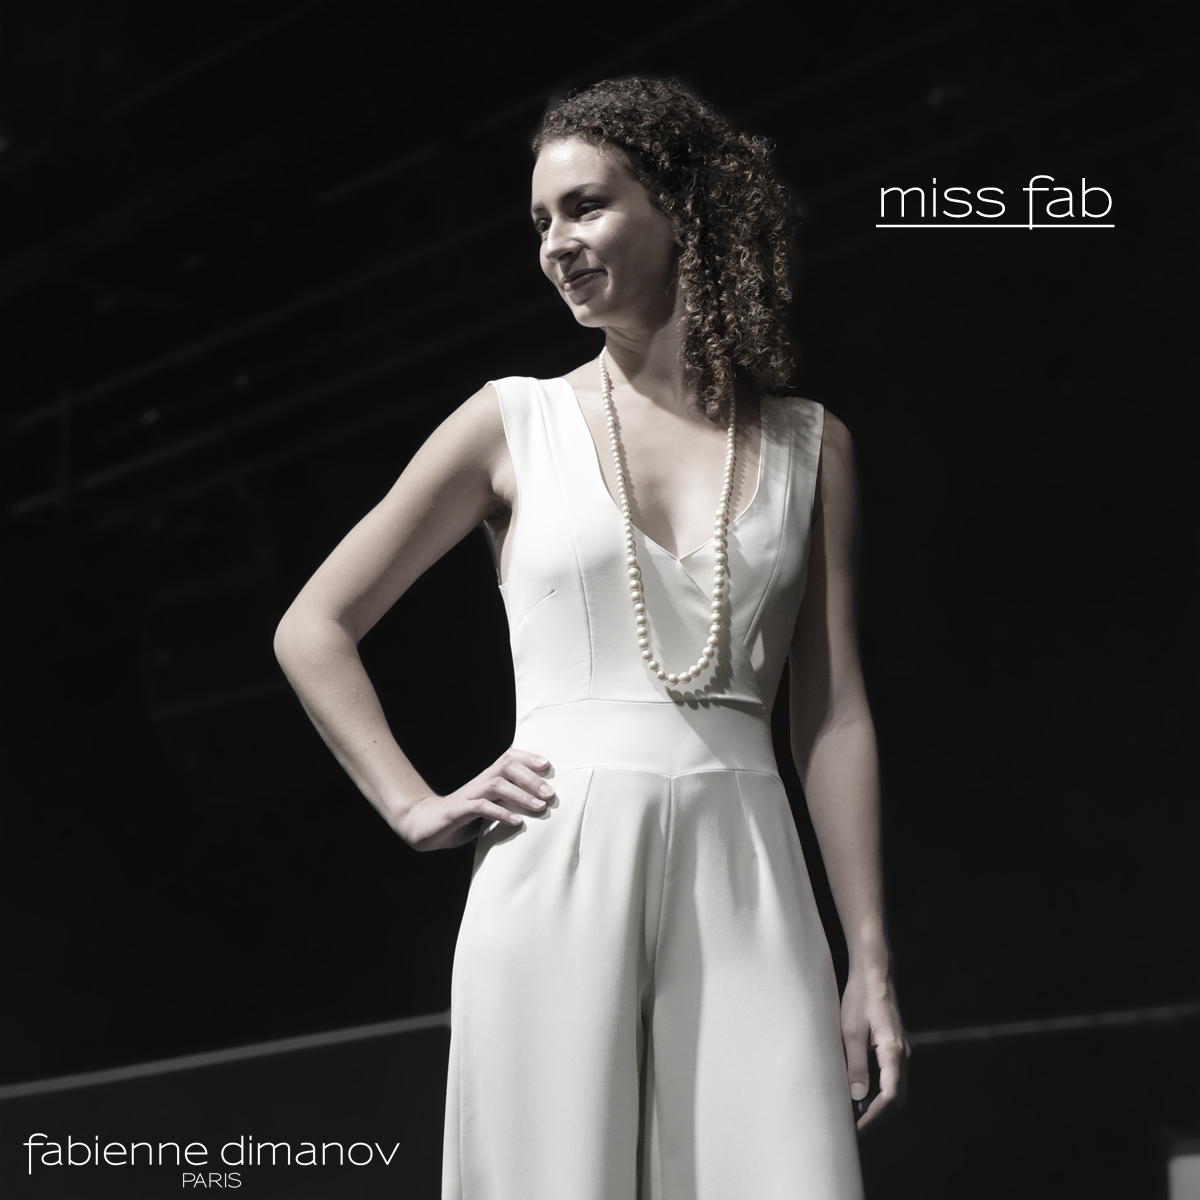 Combi perso Miss Fab - Fabienne Dimanov paris